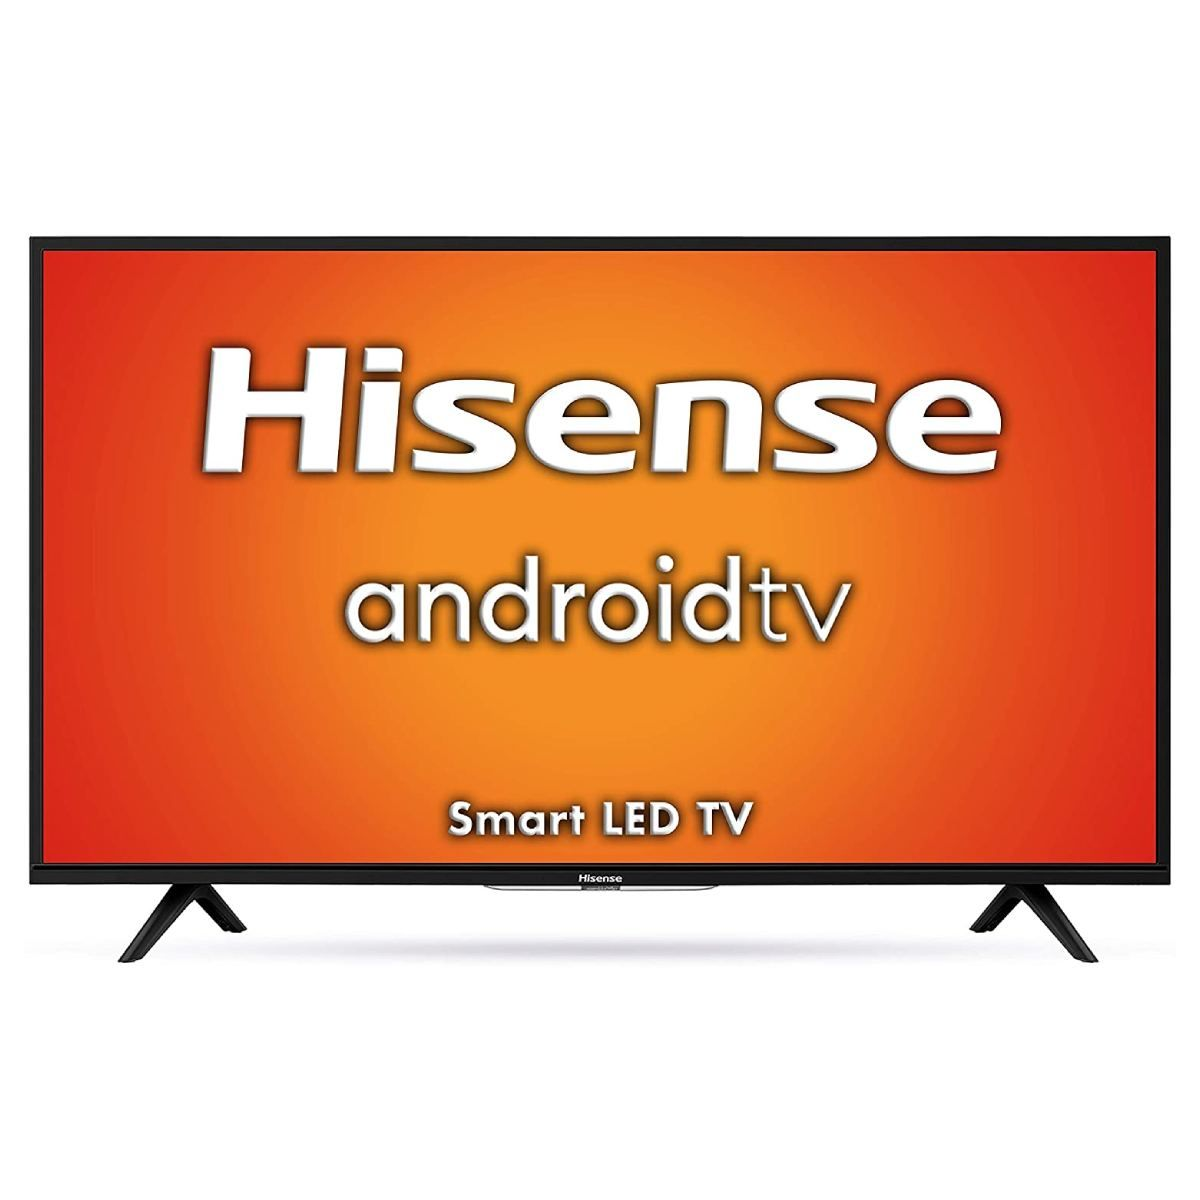 Hisense 43 ಇಂಚುಗಳು Full HD Smart Certified ಆ್ಯಂಡ್ರಾಯ್ಡ್ LED TV (43A56E)